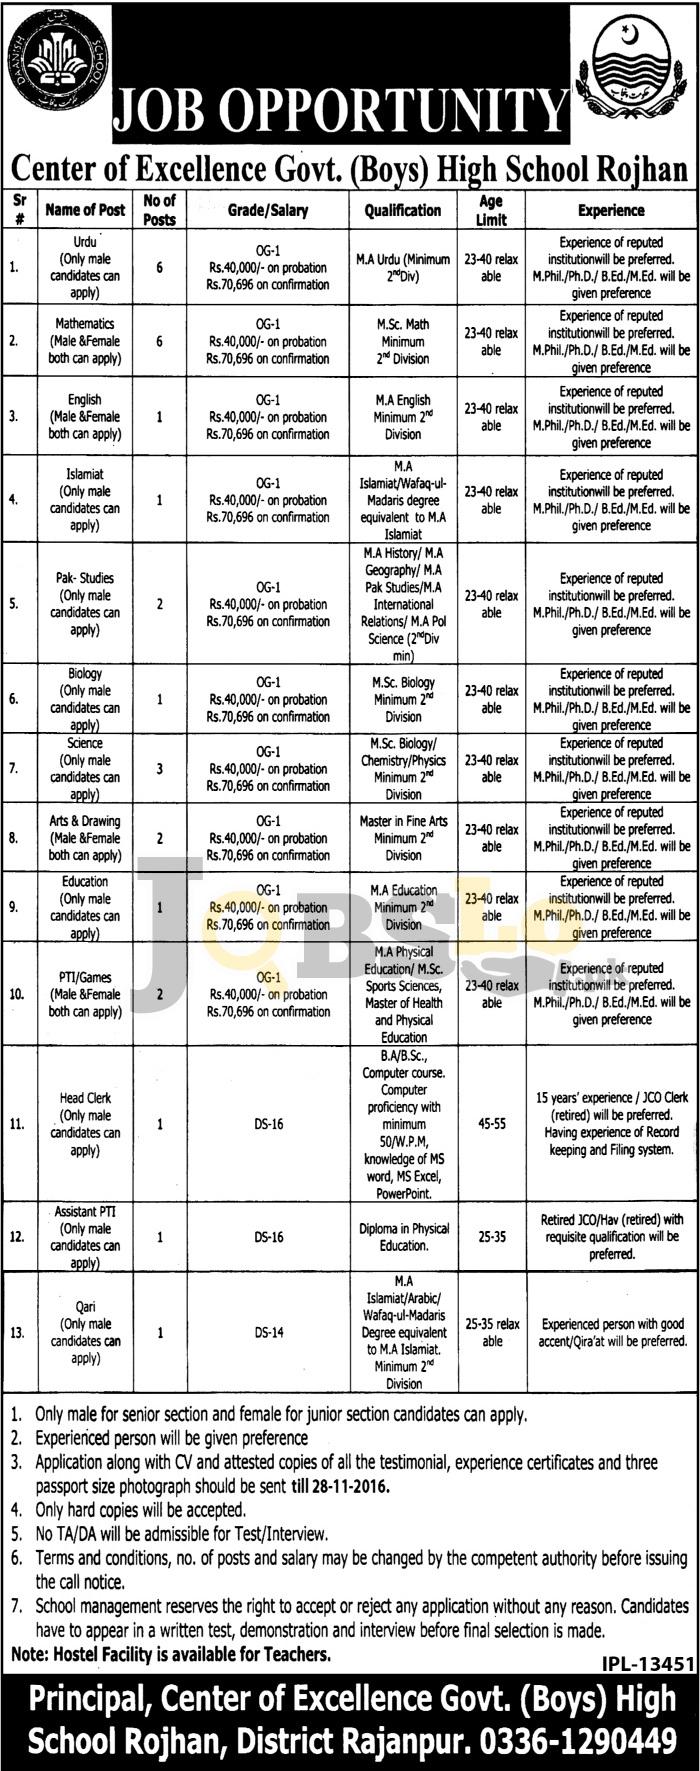 Centre of Excellence Govt (Boys) High School Rojhan Jobs 2016 Faculty & Non-Faculty Required